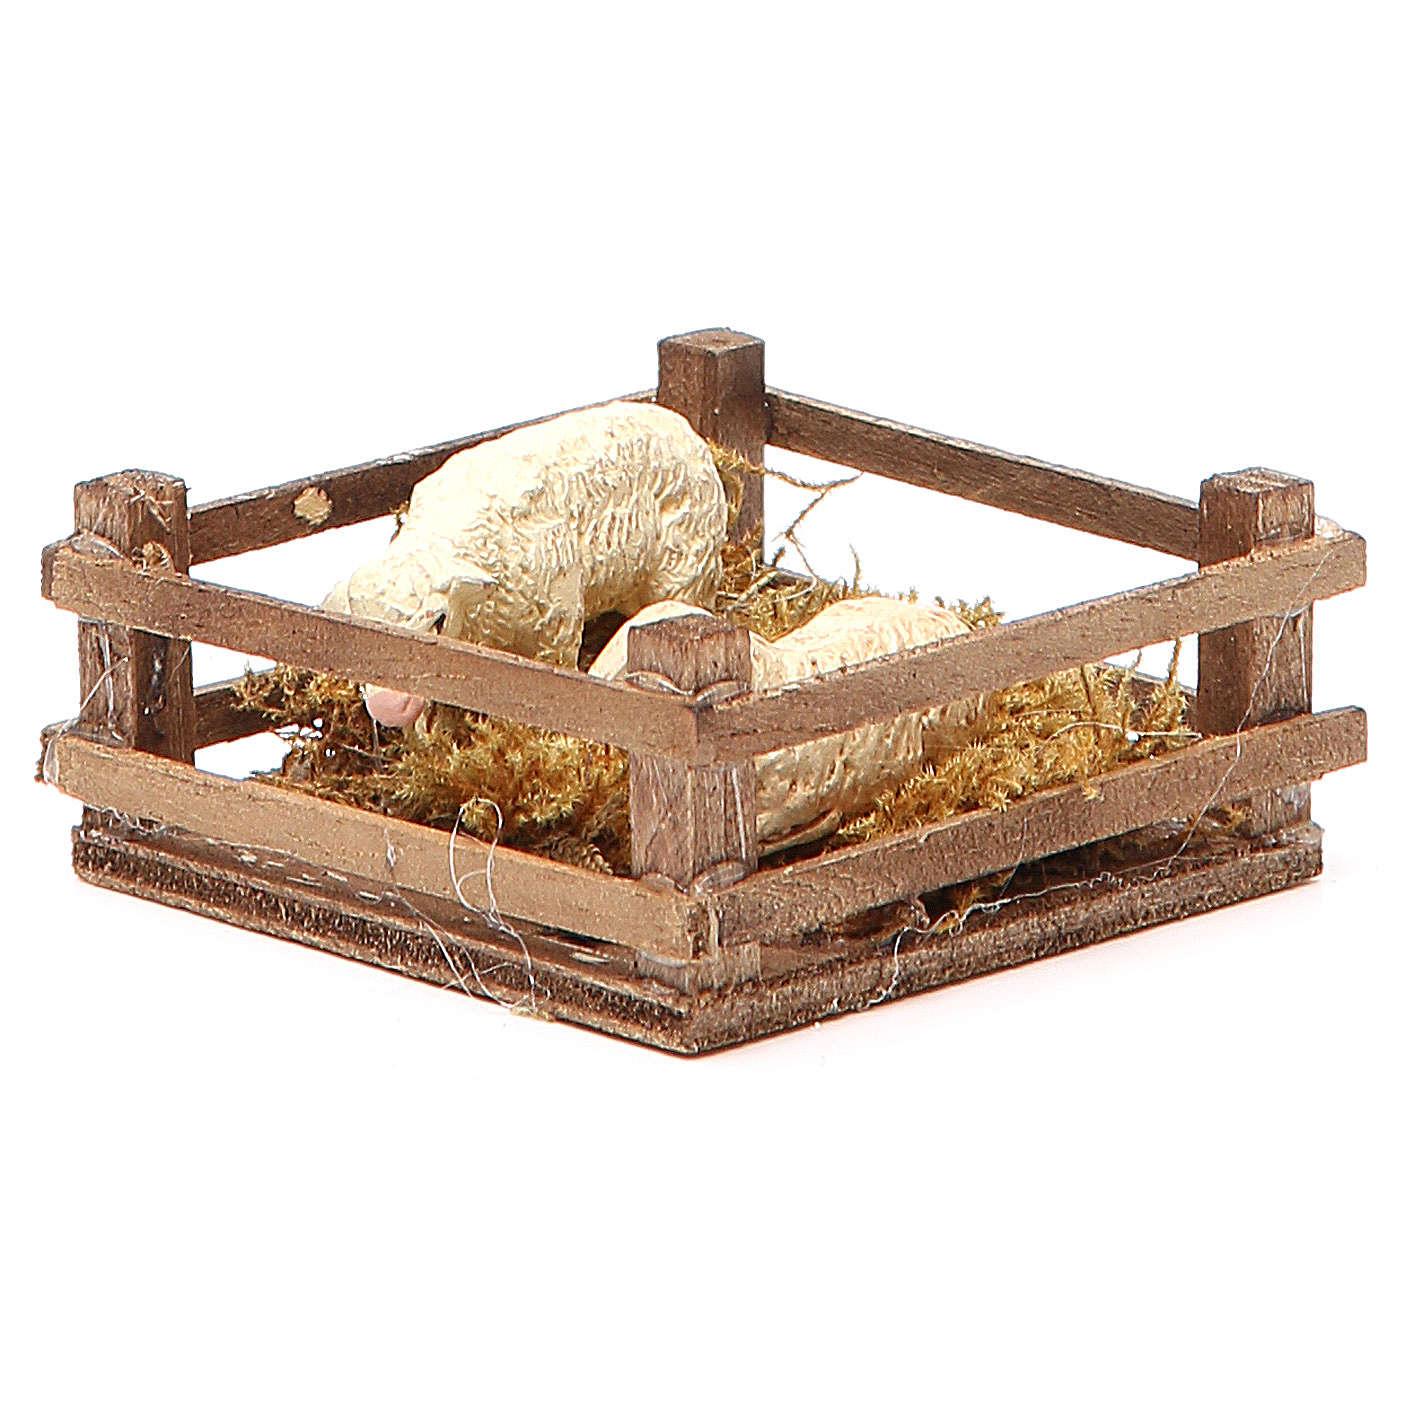 Recinto con ovejas 3x6.5x6.5 cm belén Nápoles 4